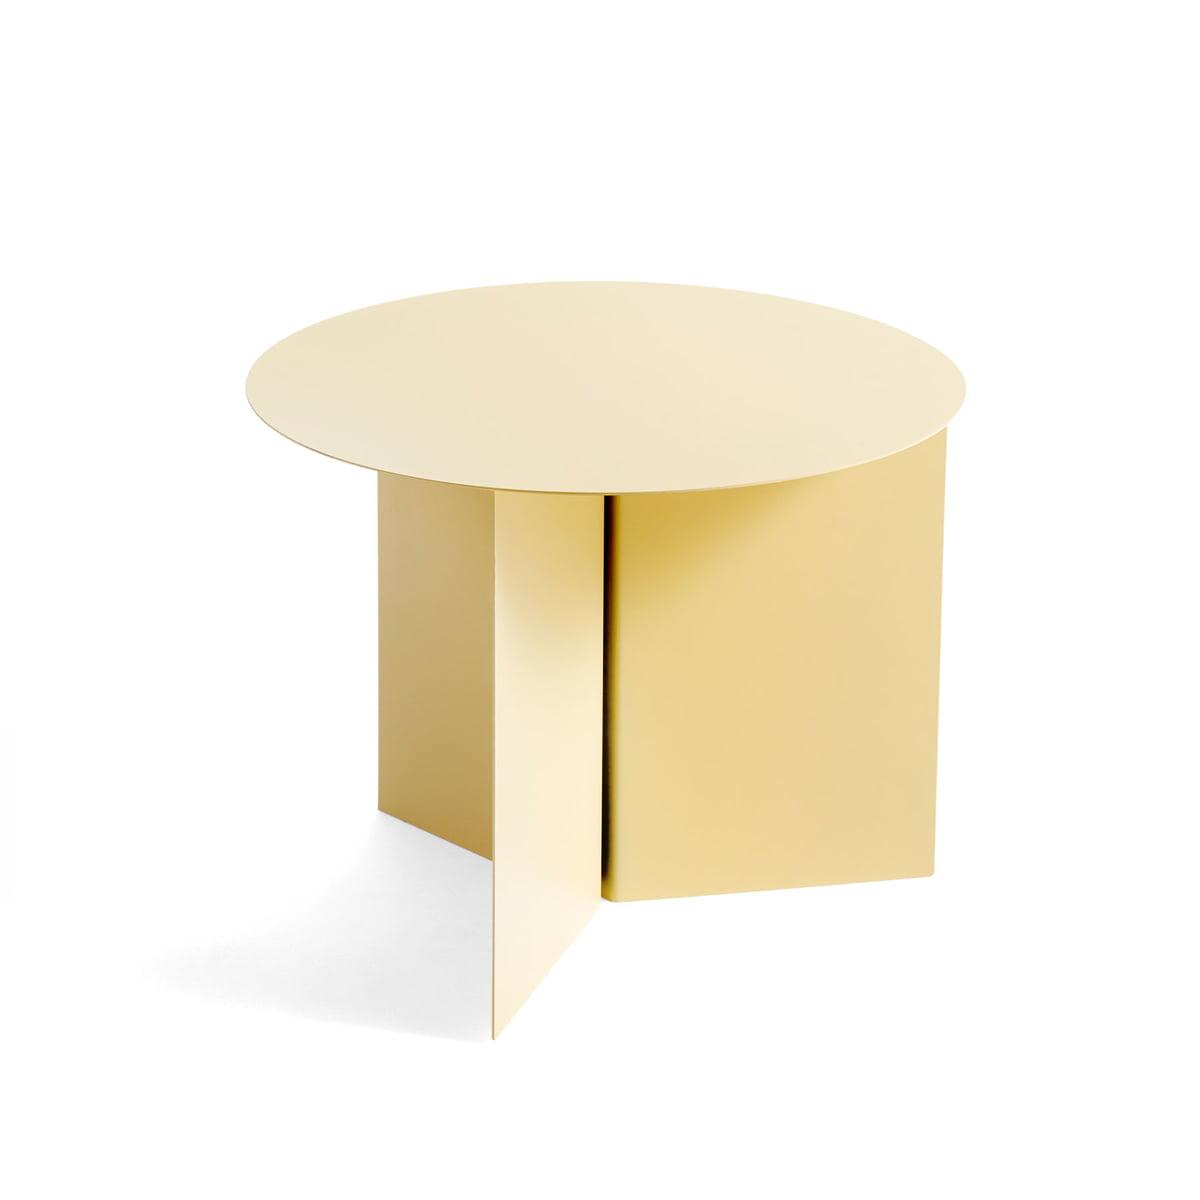 Hay slit table round 45 x 35 5 cm hellgelb frei